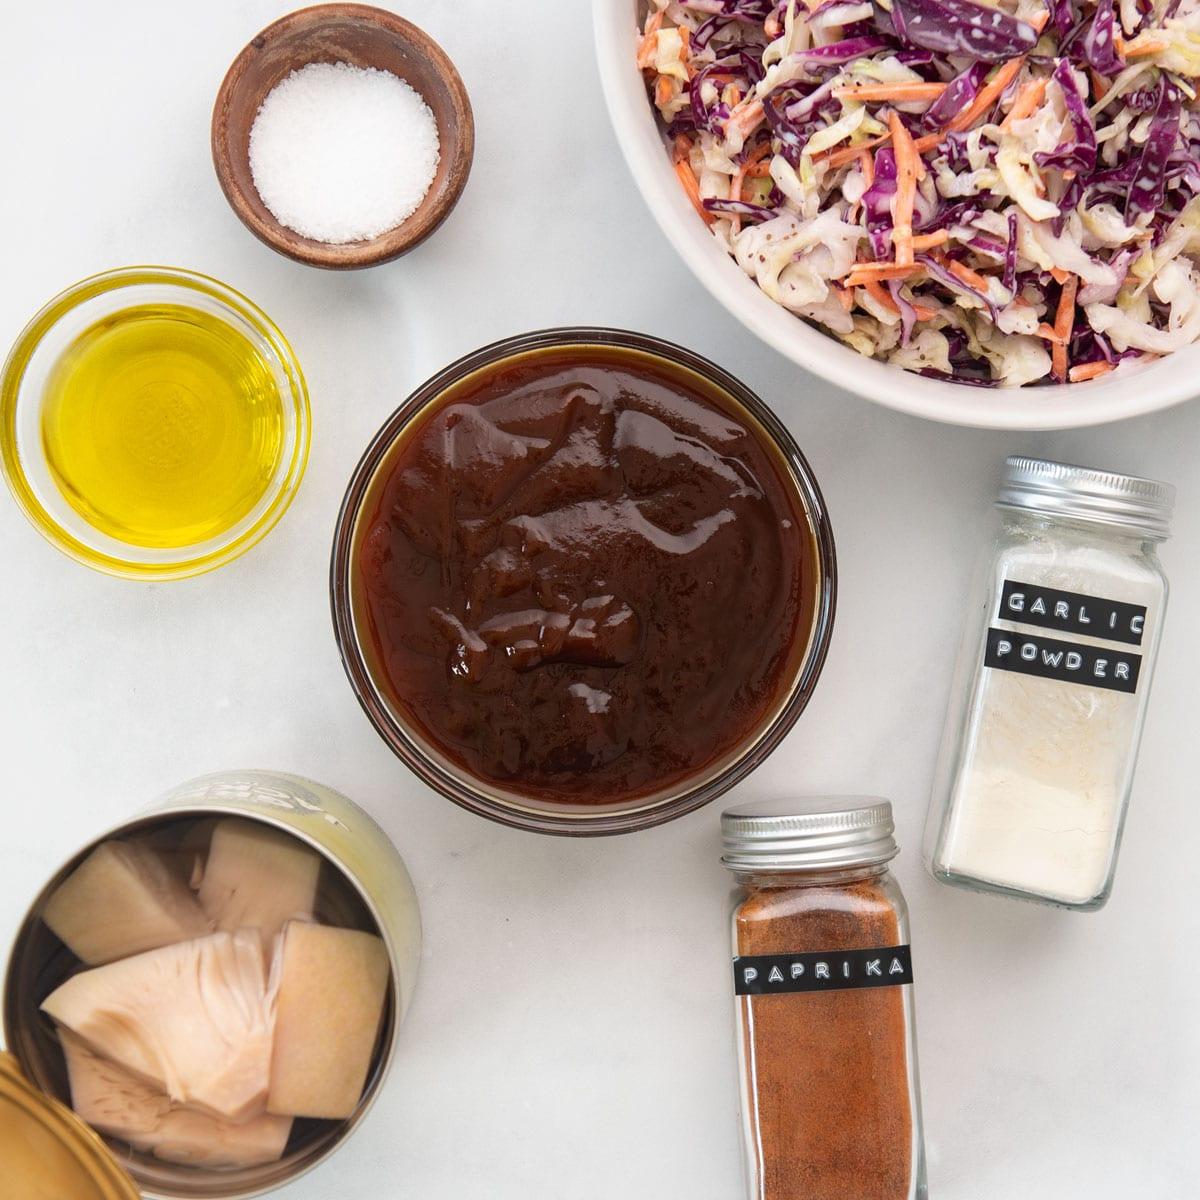 hamburger buns, bbq sauce, coleslaw, jackfruit, and seasonings on wooden board